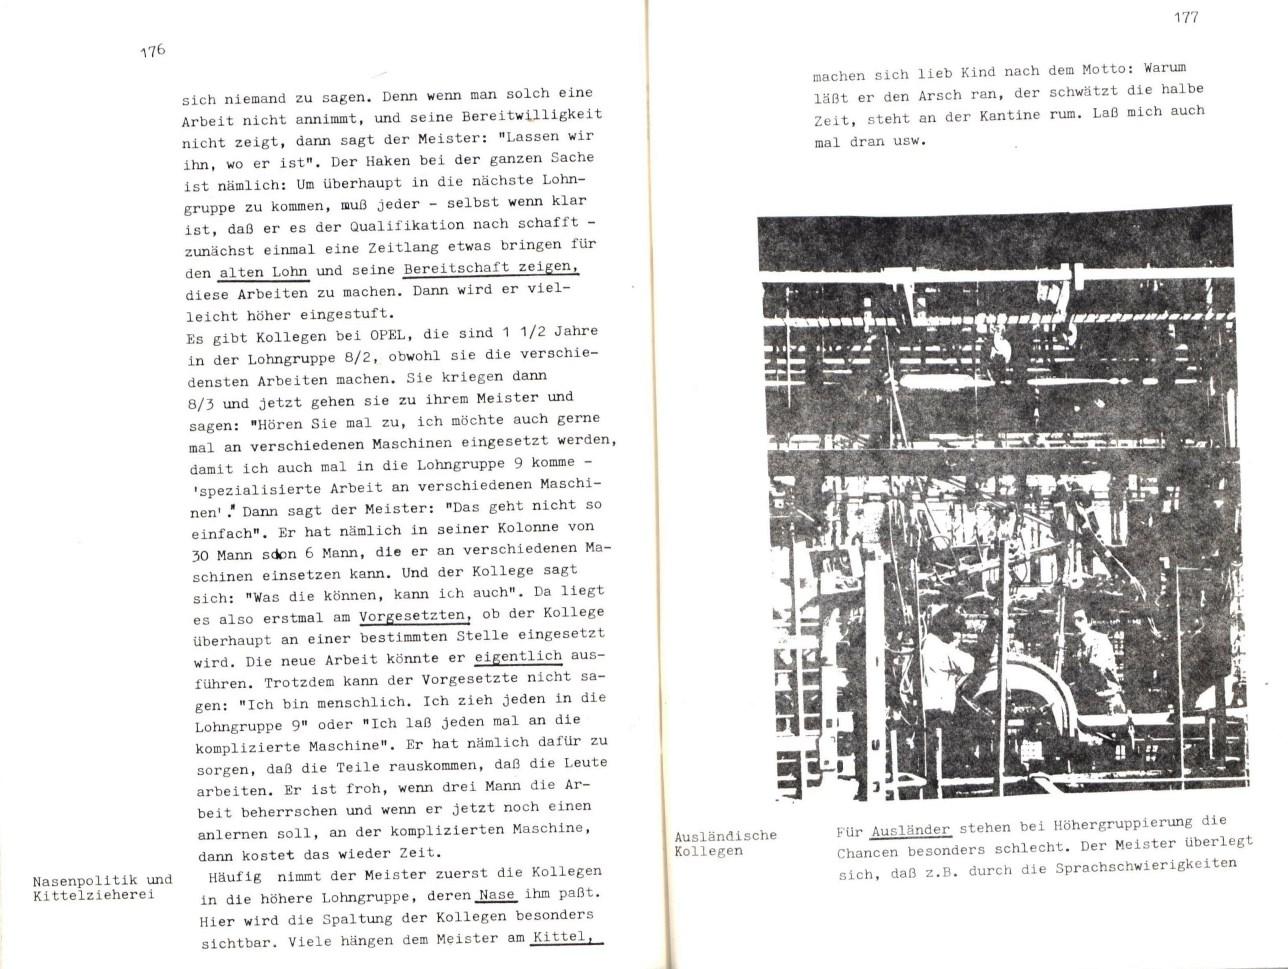 Bochum_IGM_Opel_PG_Opel_streikt_1973_091